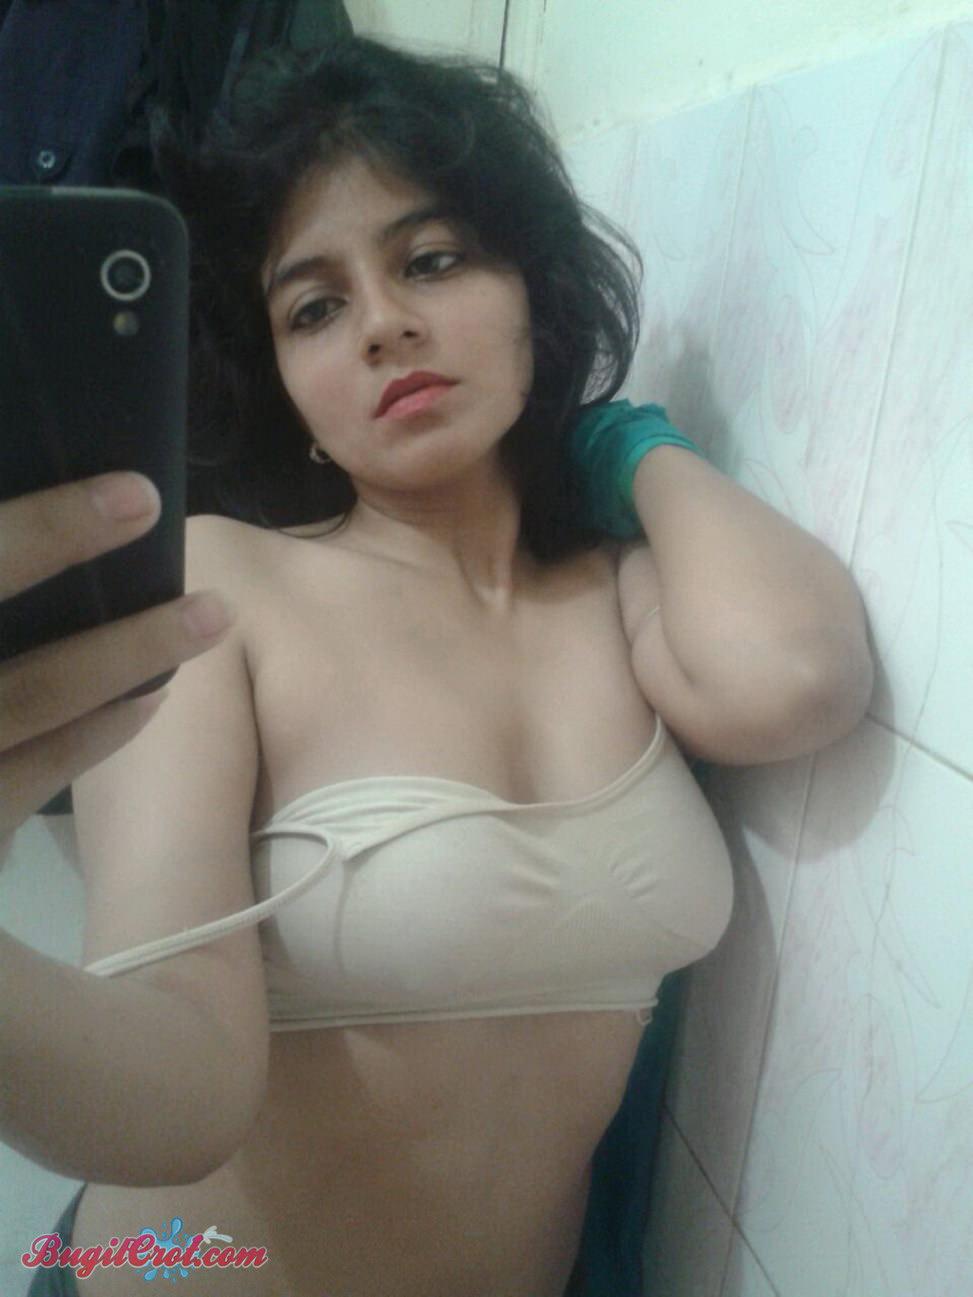 Foto selfie bugil cewek india cantik bahenol toket jumbo bikin ngiler